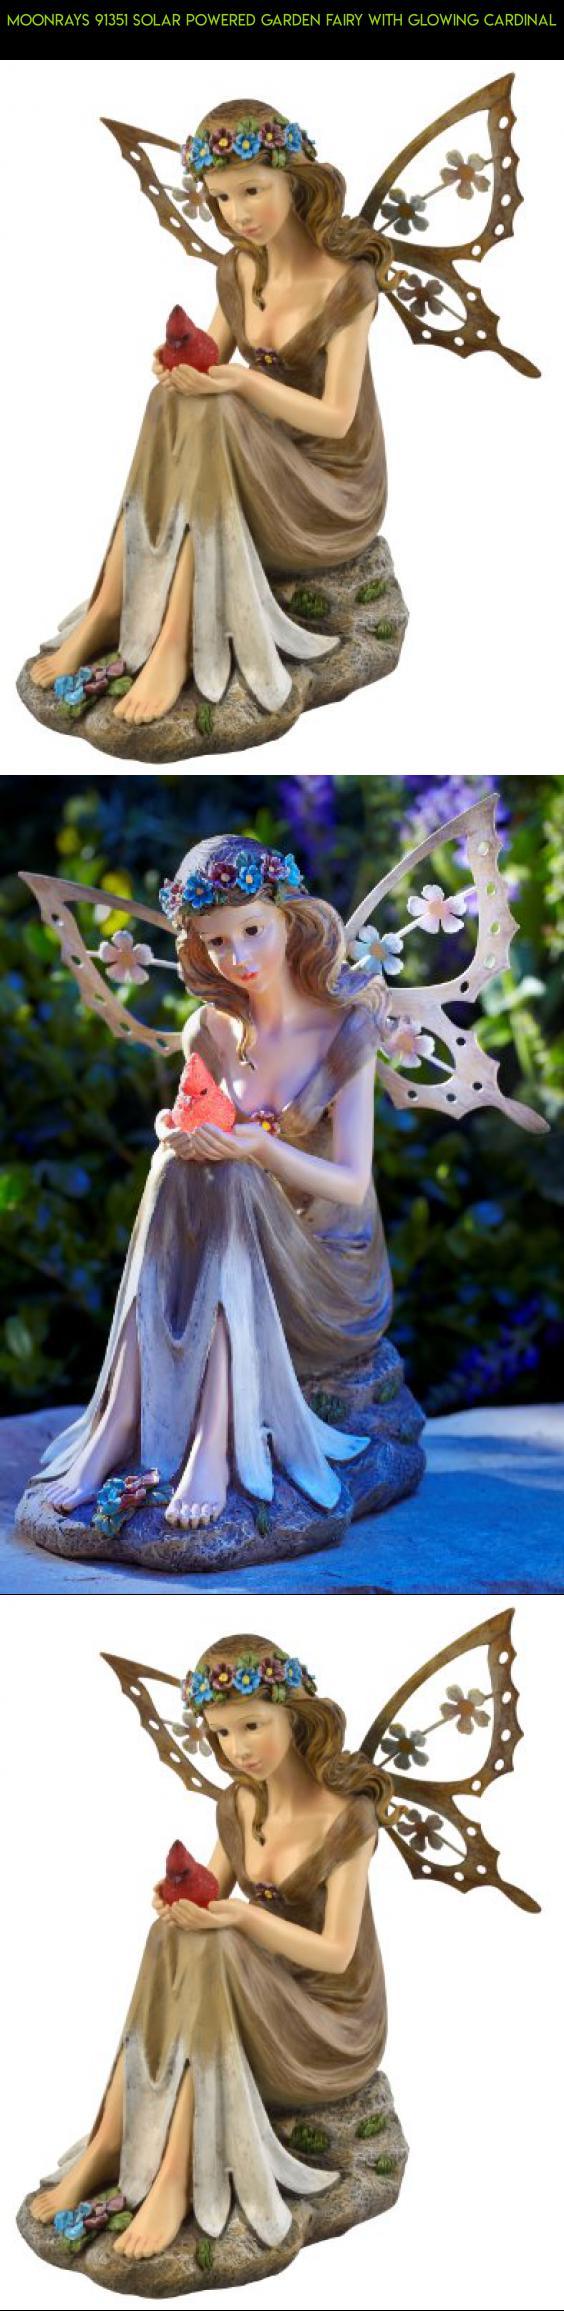 Moonrays 91351 Solar Ed Garden Fairy With Glowing Cardinal Camera Decor Unique